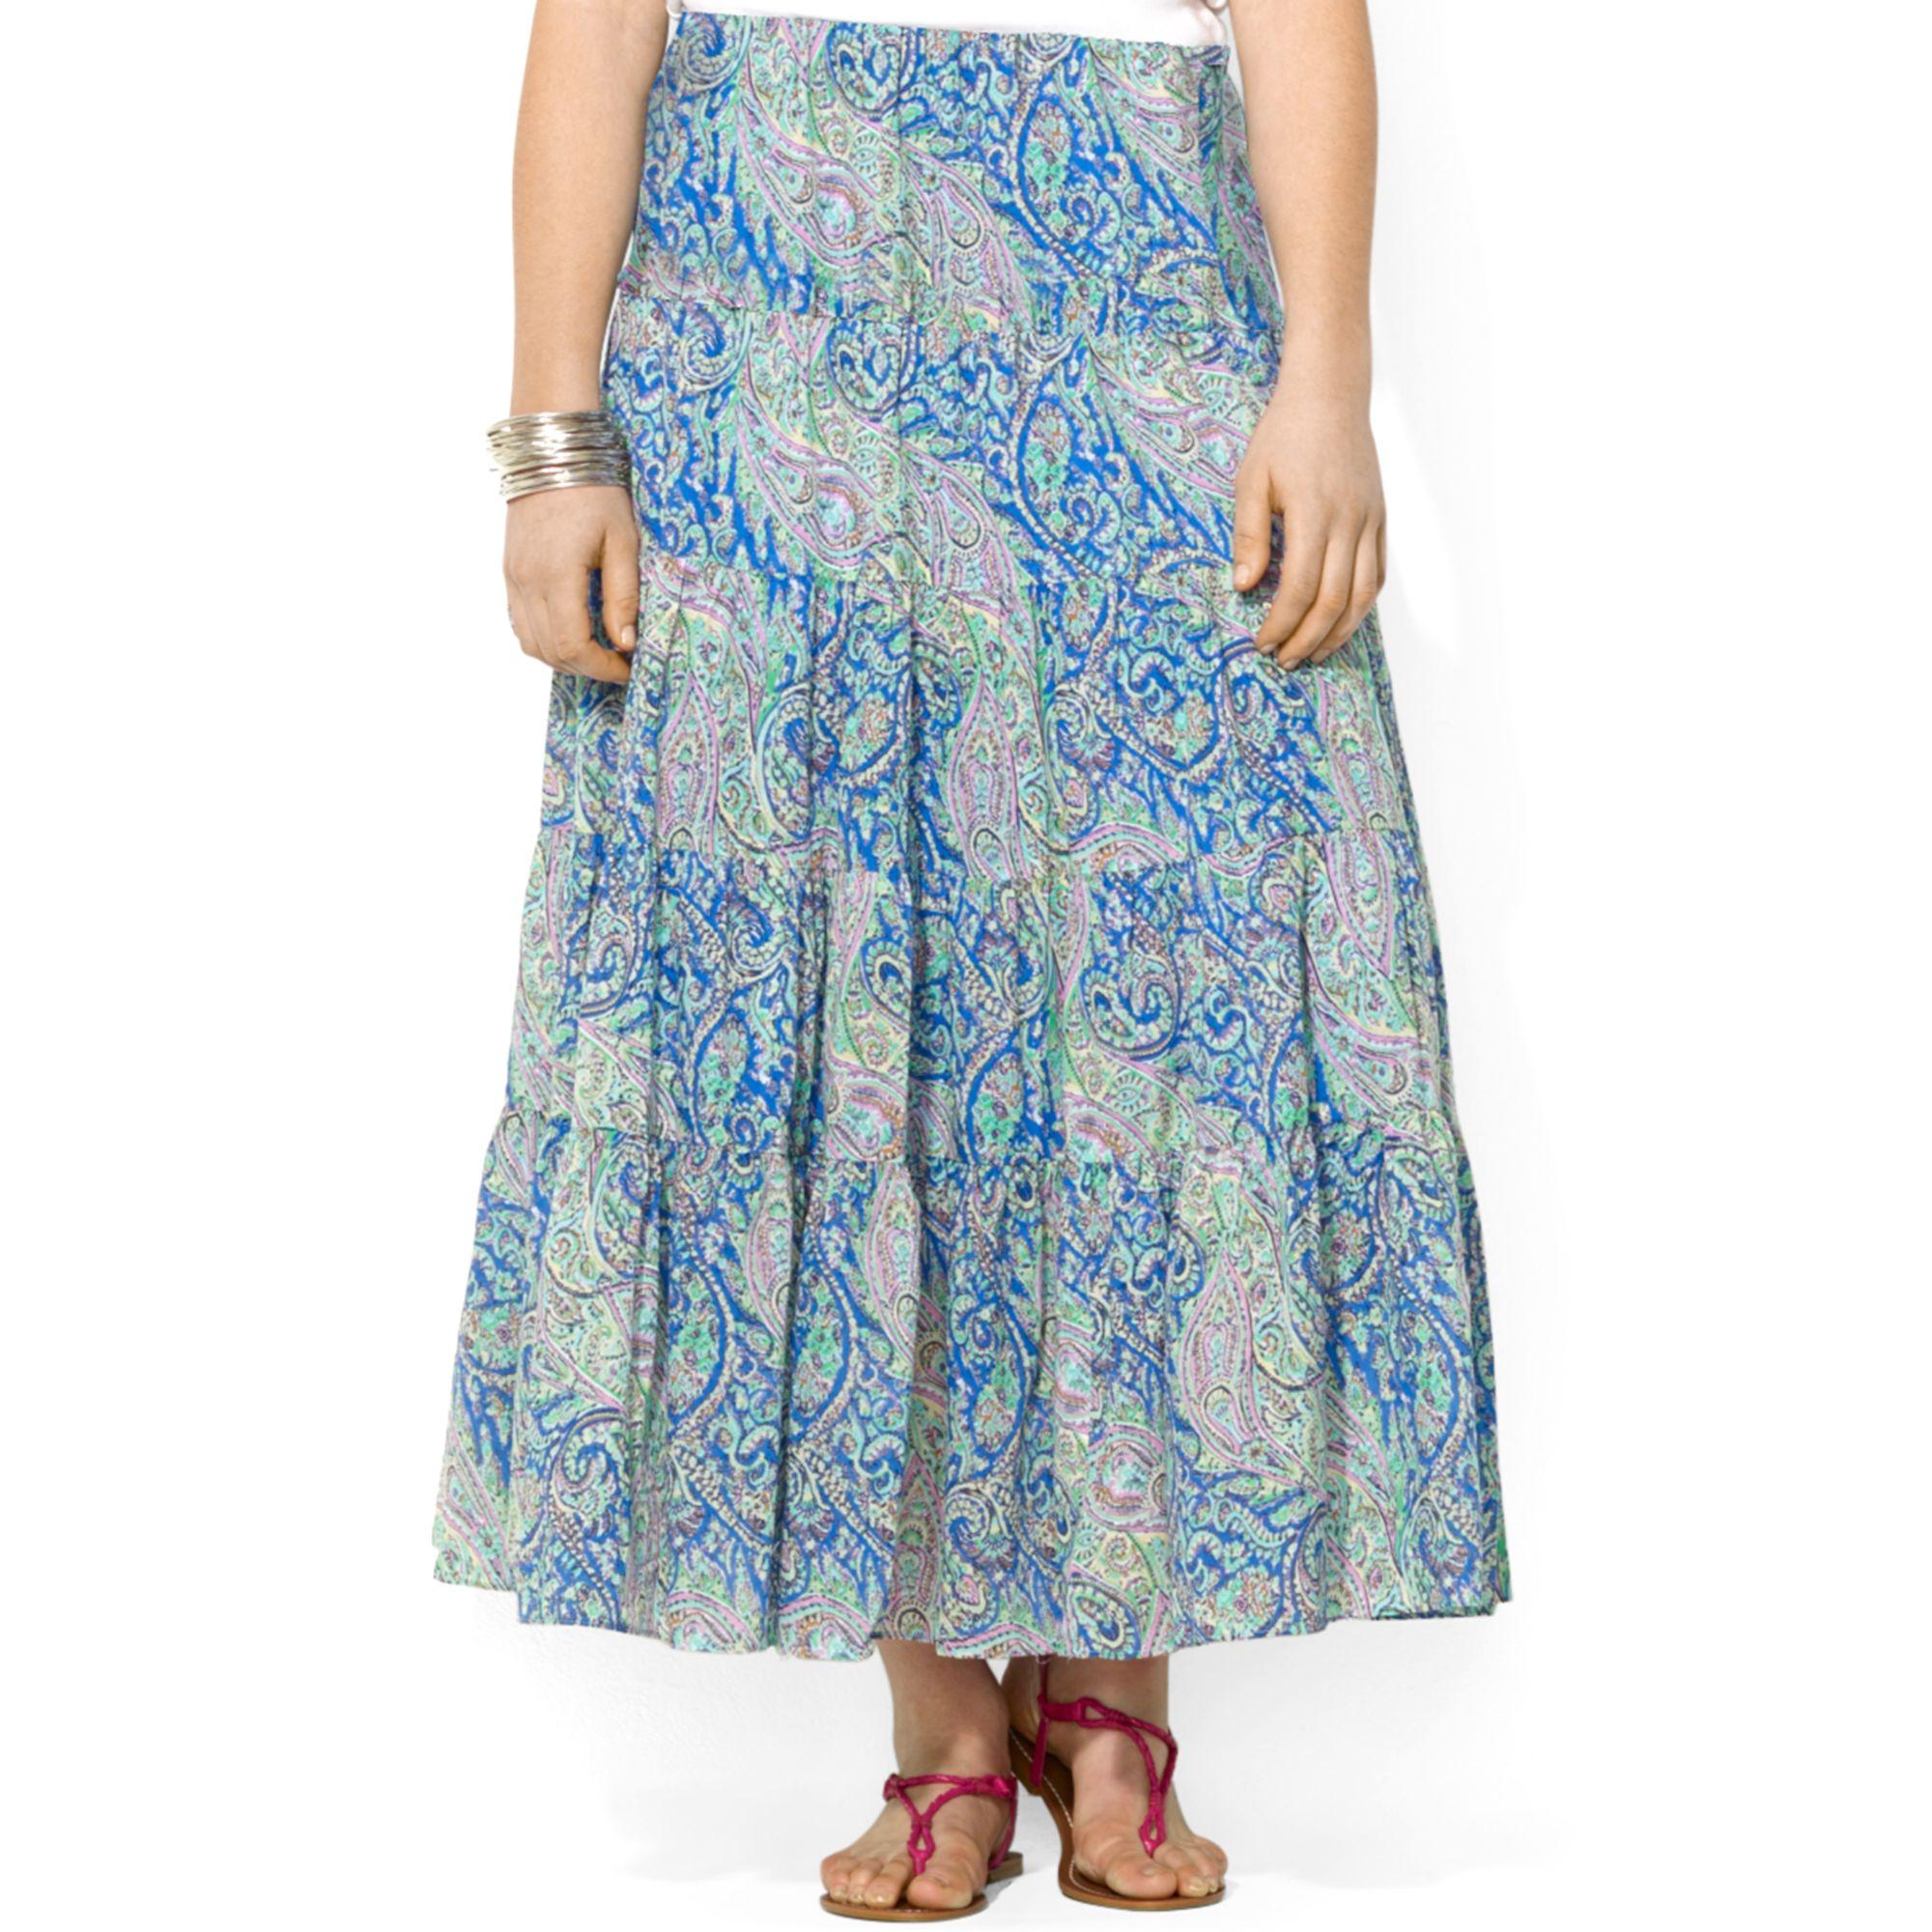 ecffbf45af10c Lyst - Lauren by Ralph Lauren Plus Size Tiered Paisleyprint Maxi ...